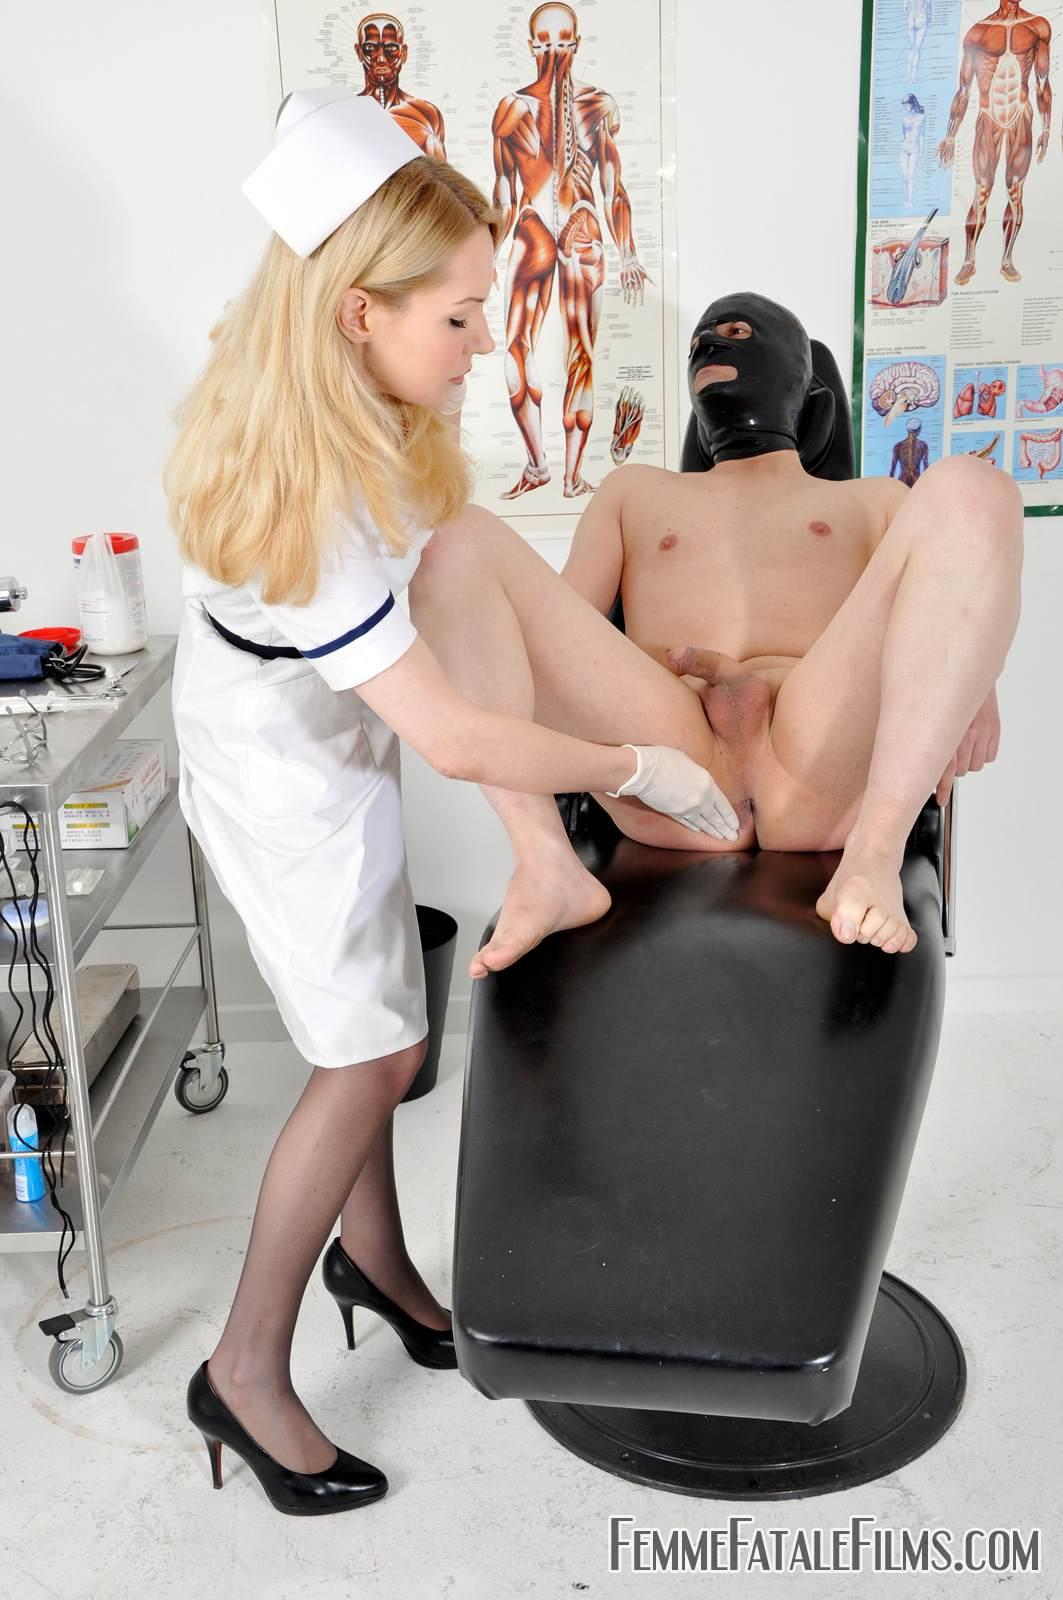 Hentai nurse milk porncraft scene